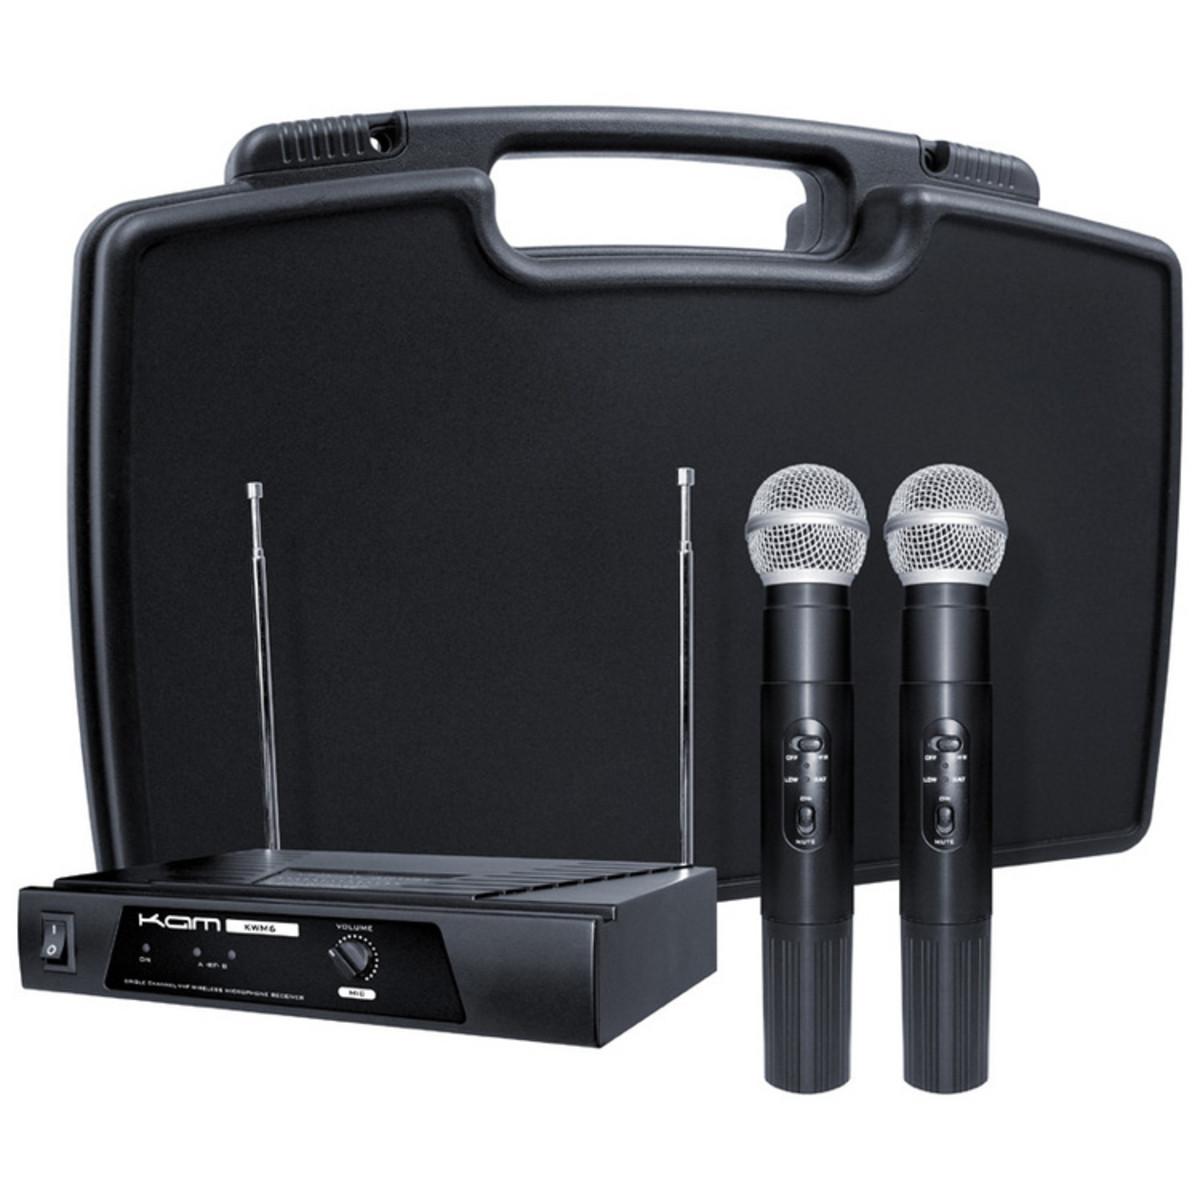 Image of KAM KWM11 Dual Handheld Wireless Microphone System 174.1/174.5